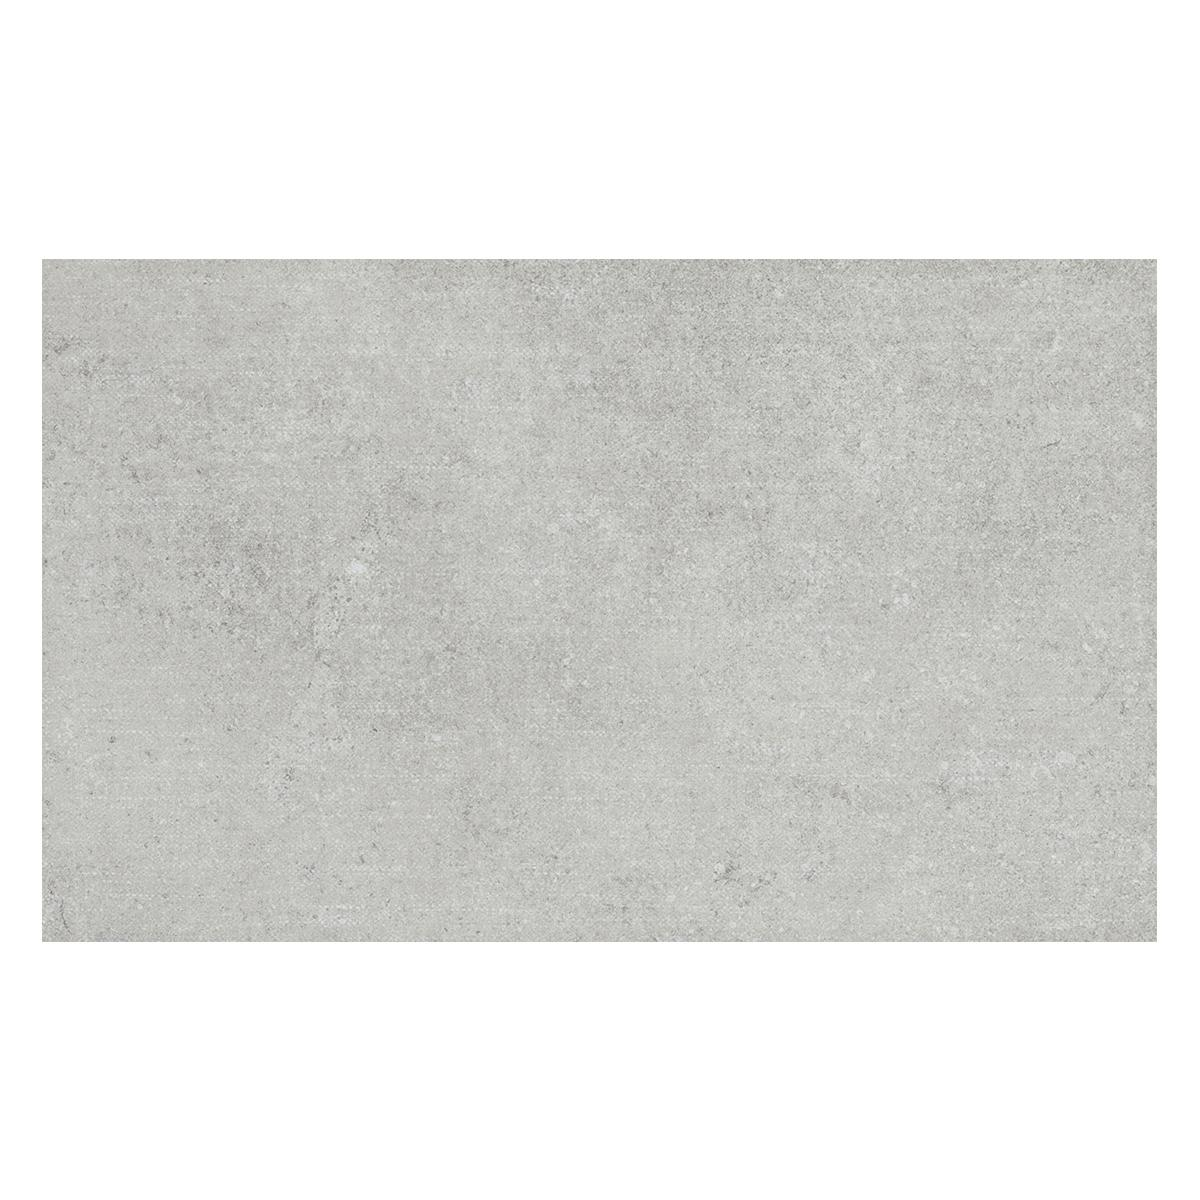 Mayólica Dundee Relieve Gris - 33.5X55 cm - 1.84 m2